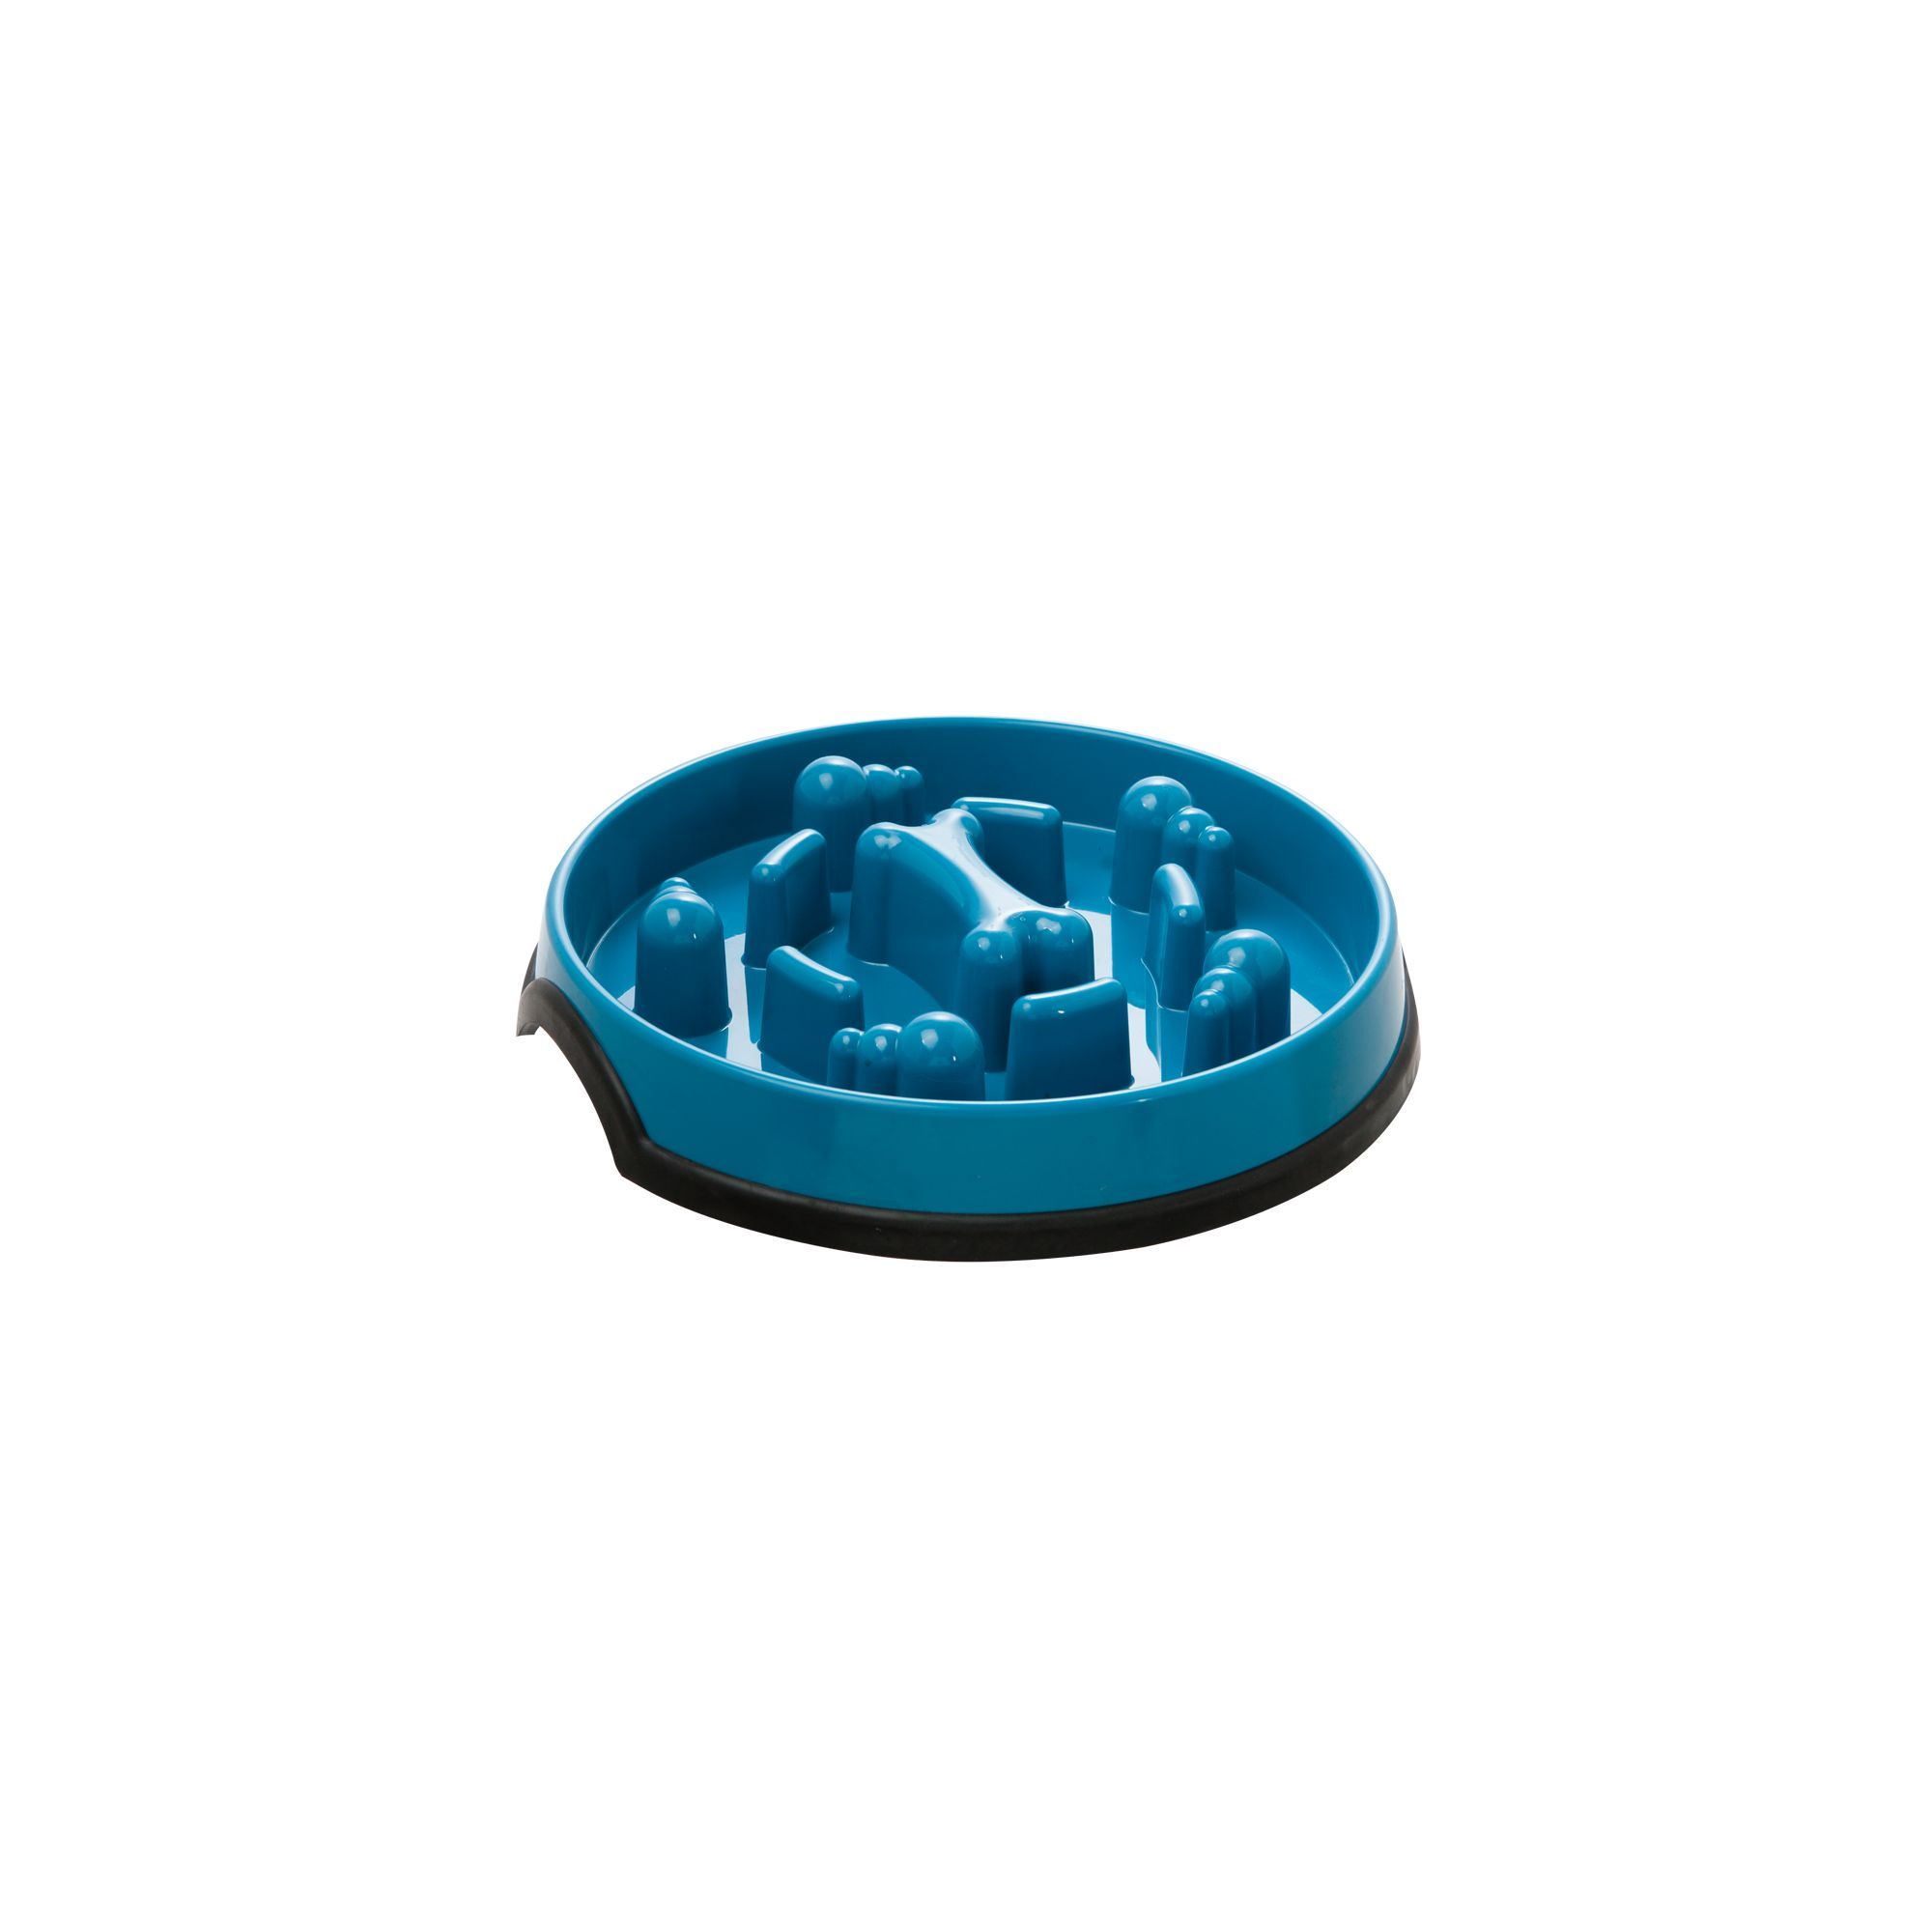 Kong Slow Feeder Puzzle Dog Bowl Blue Dog Bowls Slow Feeder